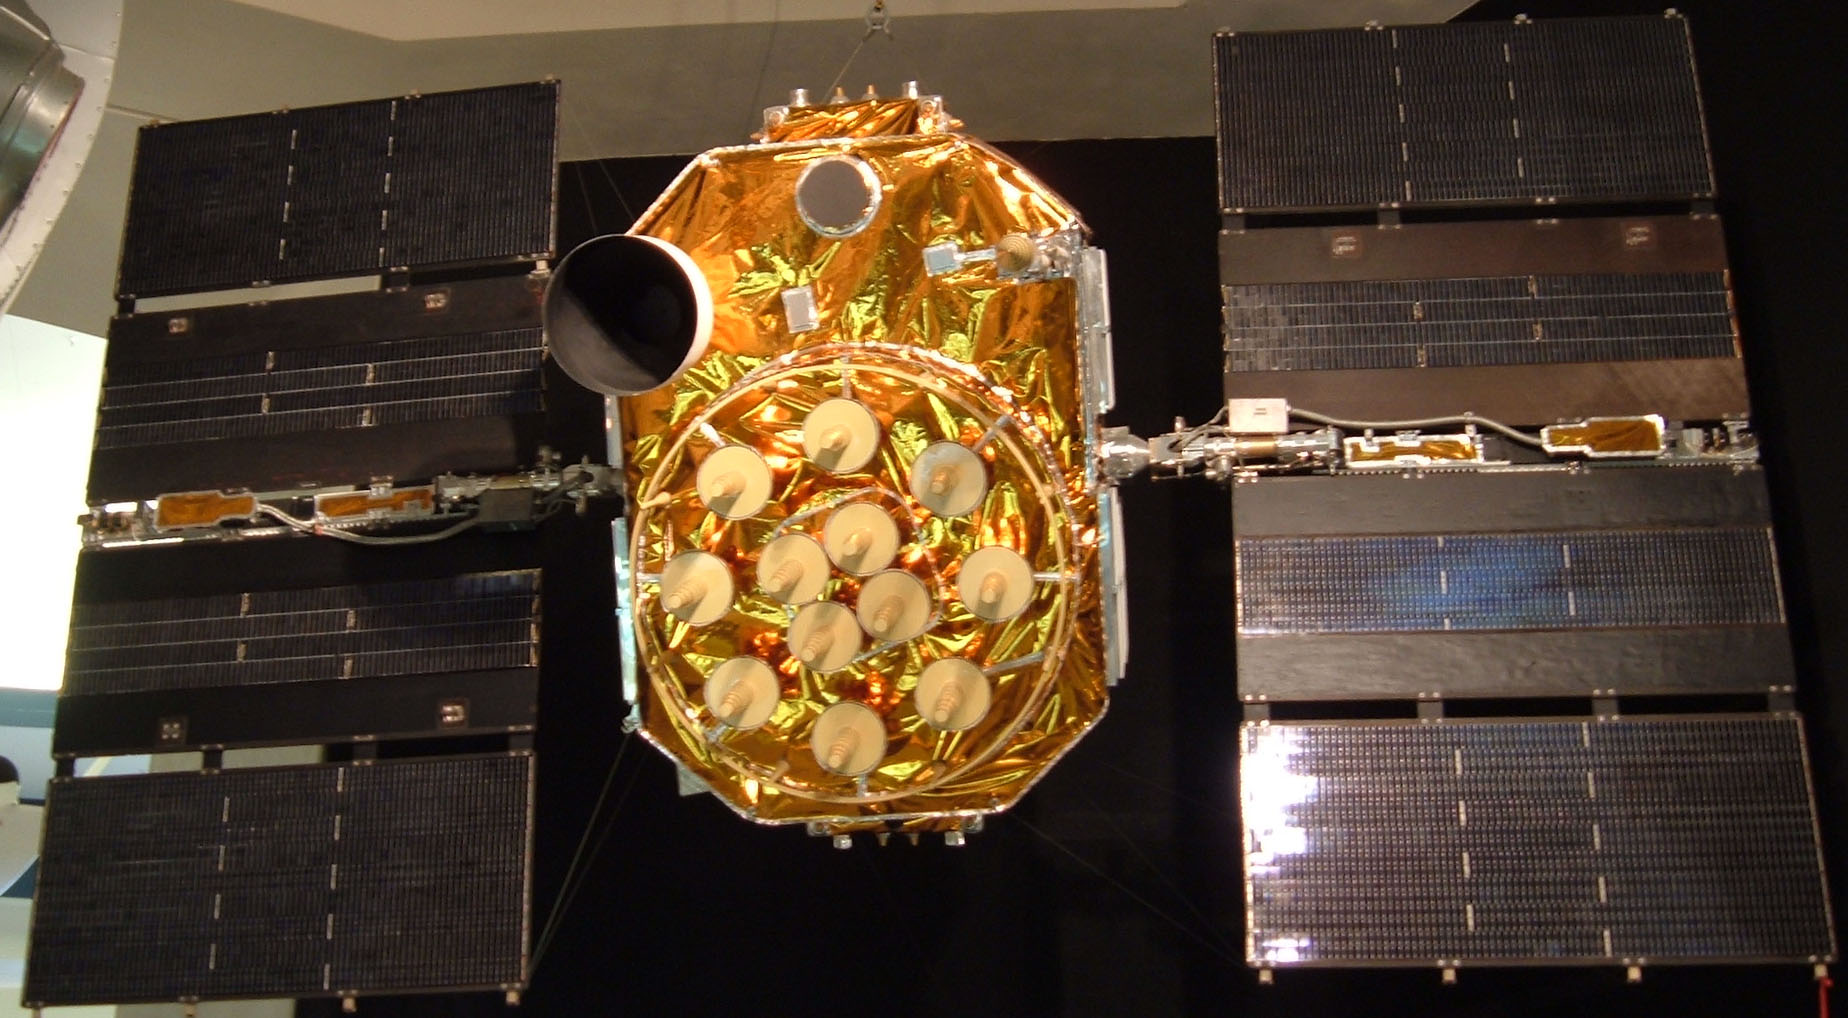 Global_Positioning_System_satellite.jpg